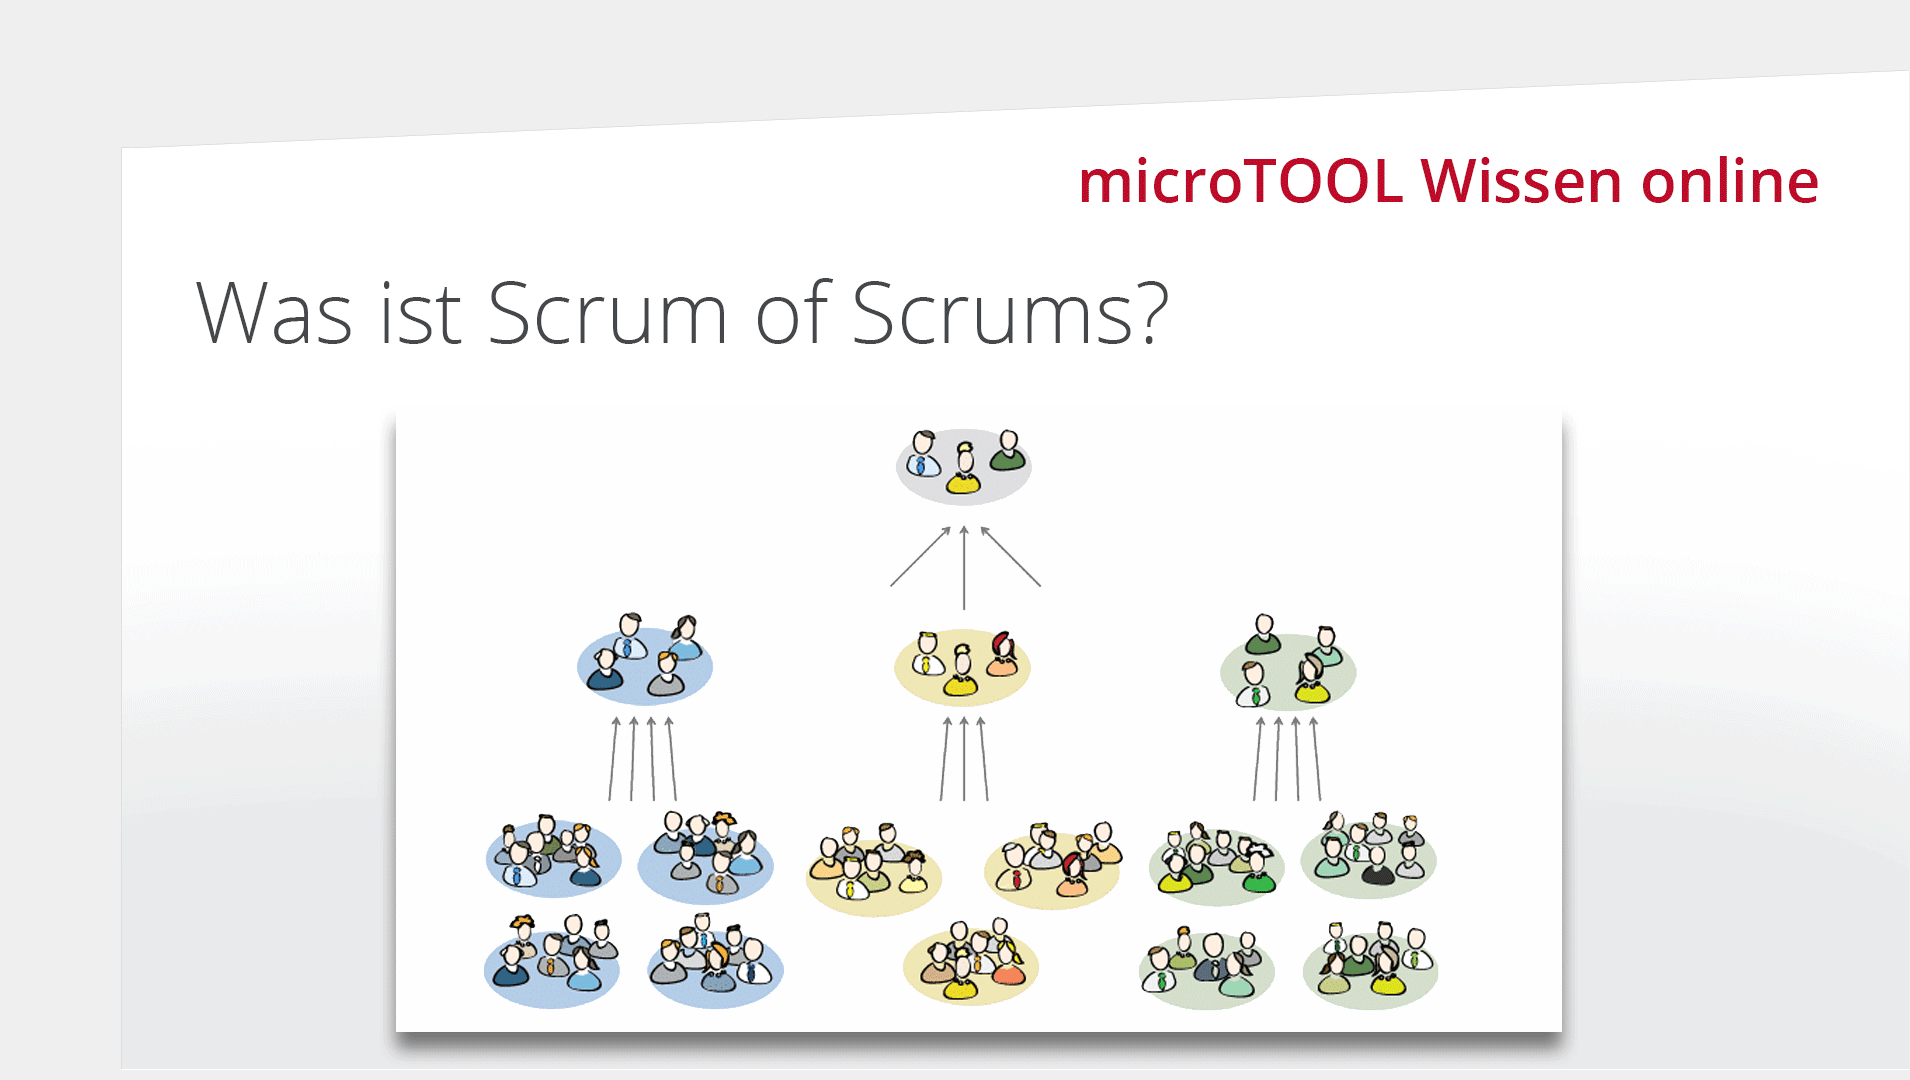 Was ist Scrum of Scrums?